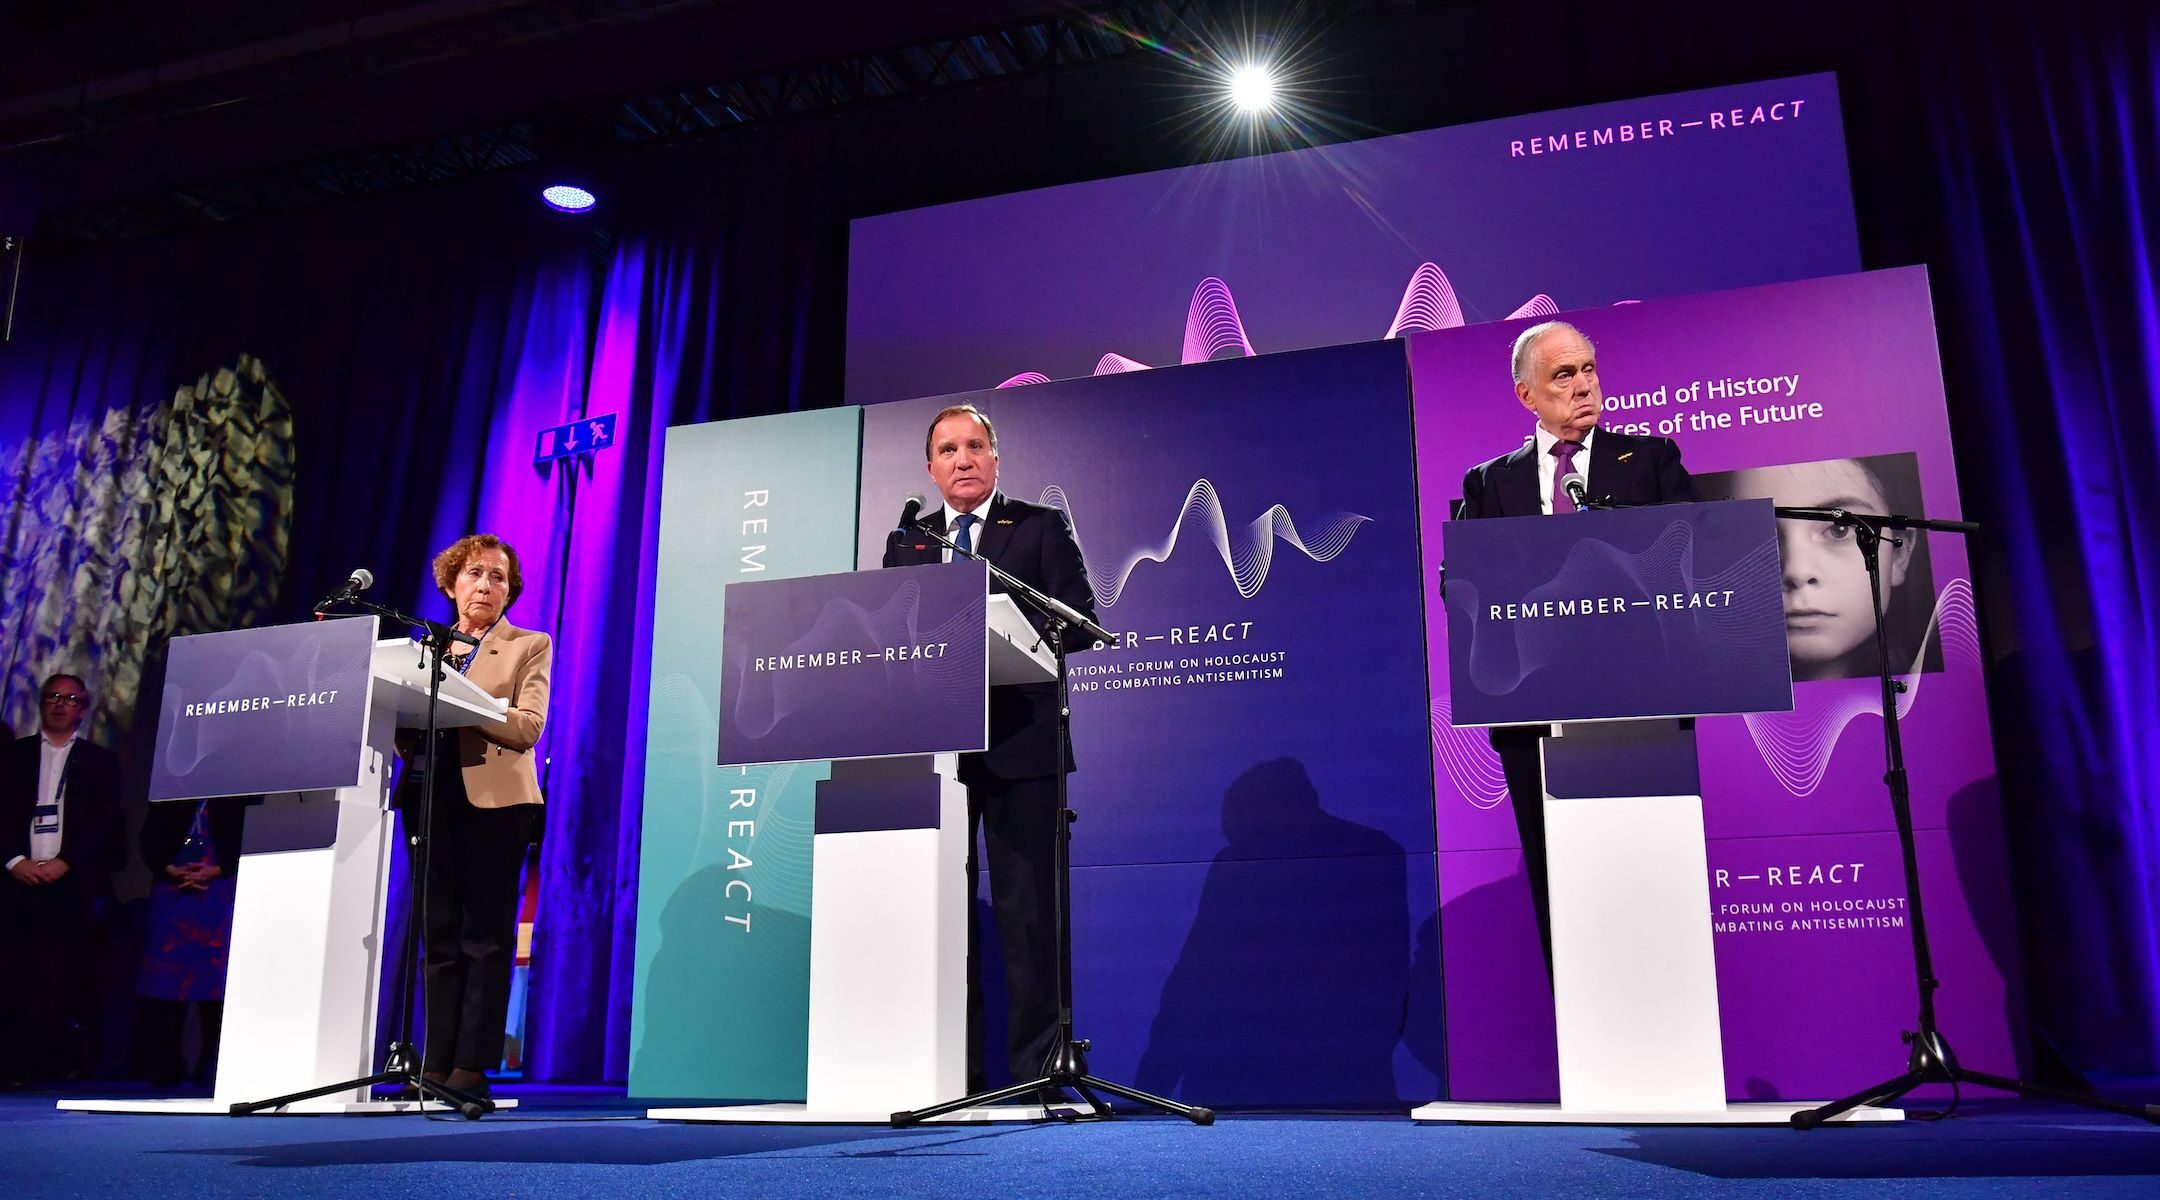 Sweden's prime minister speaks at antisemitism event